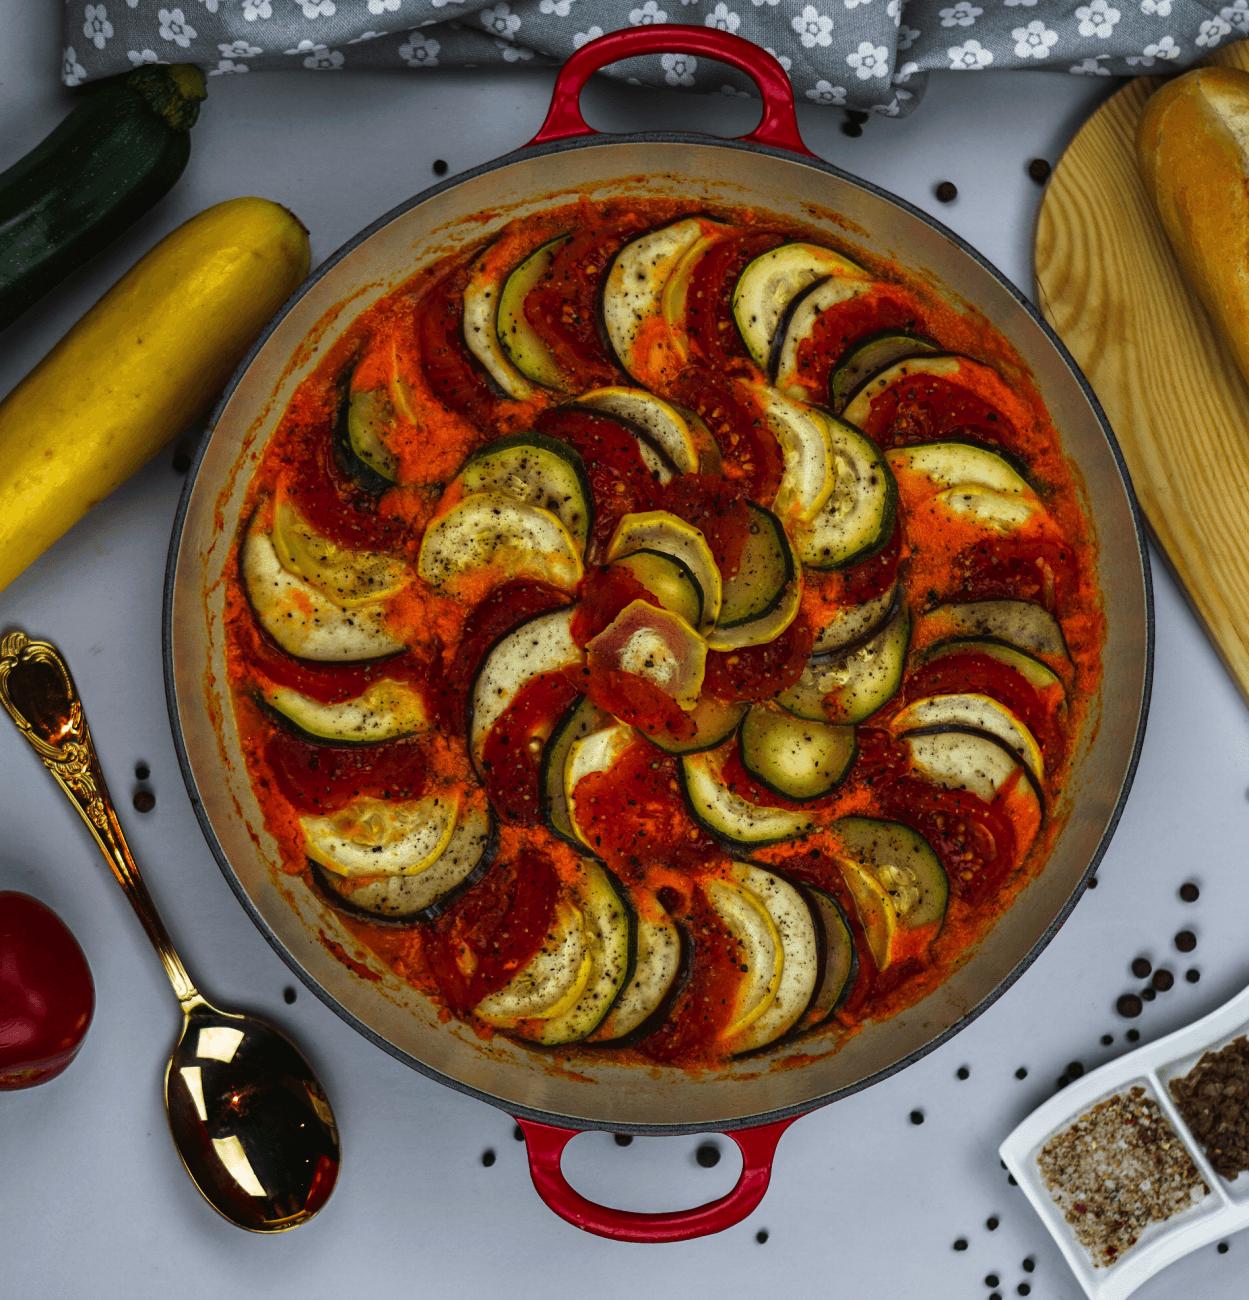 Ratatouille mit Rezept aus dem Film von Chef Remi